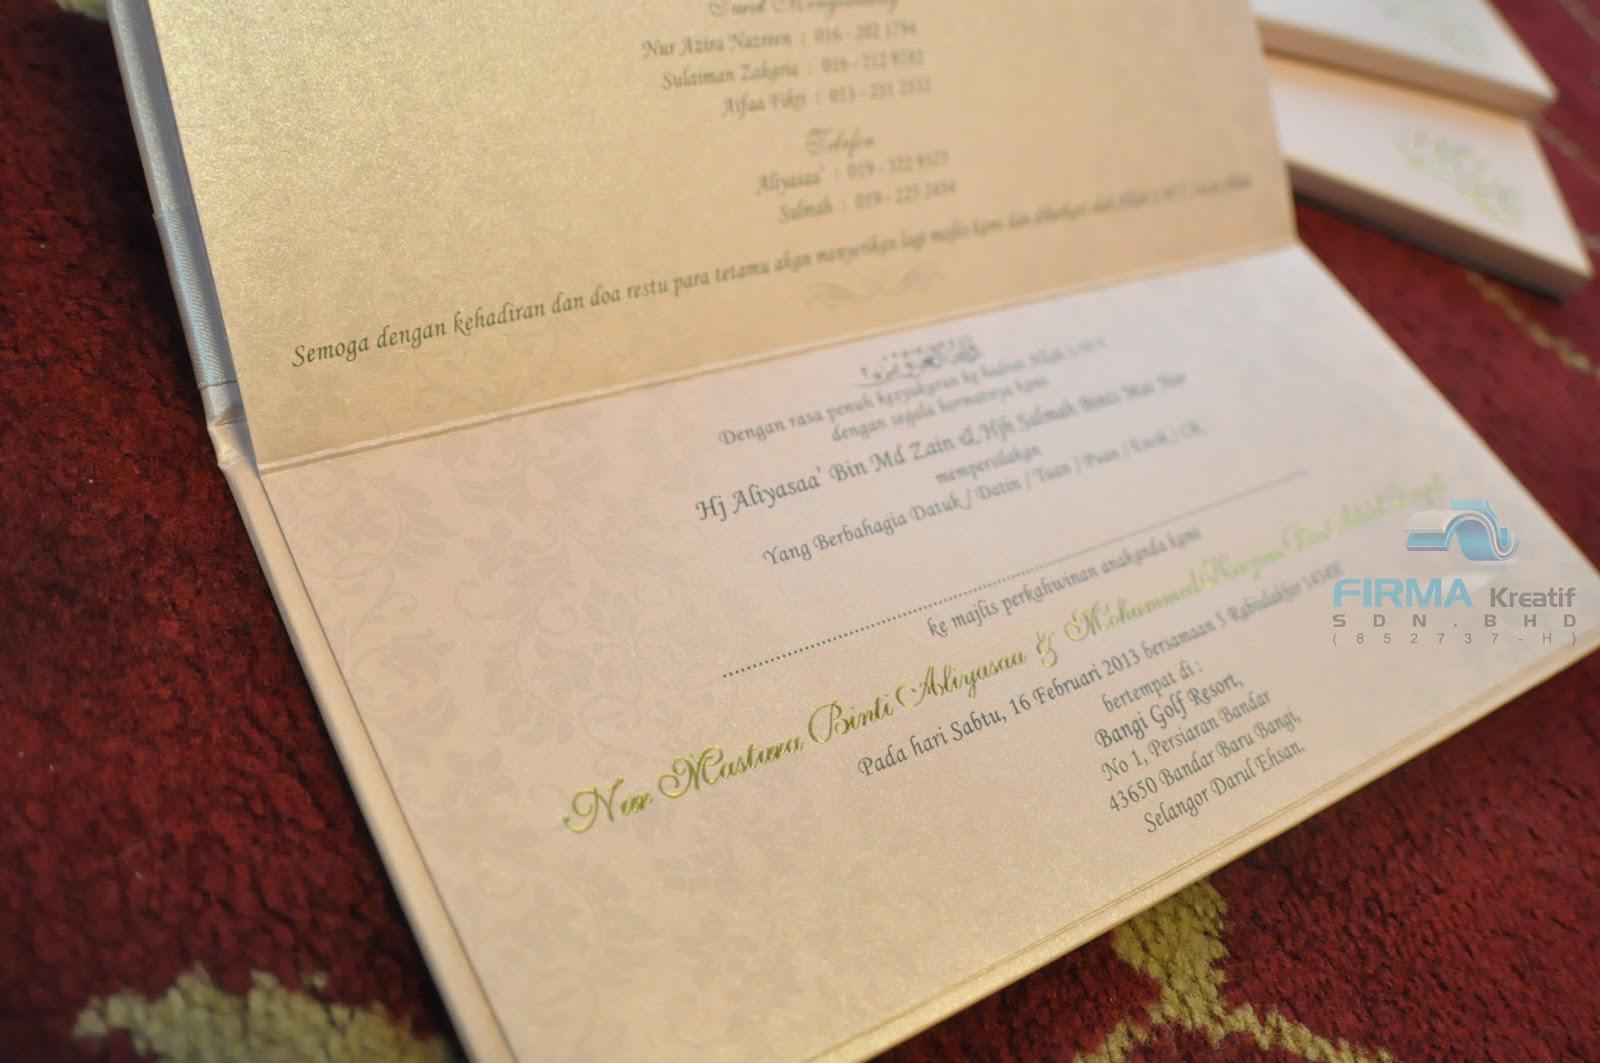 Firma kreatif sdn bhd january 2013 wedding card hardcover mastura hazimi stopboris Images